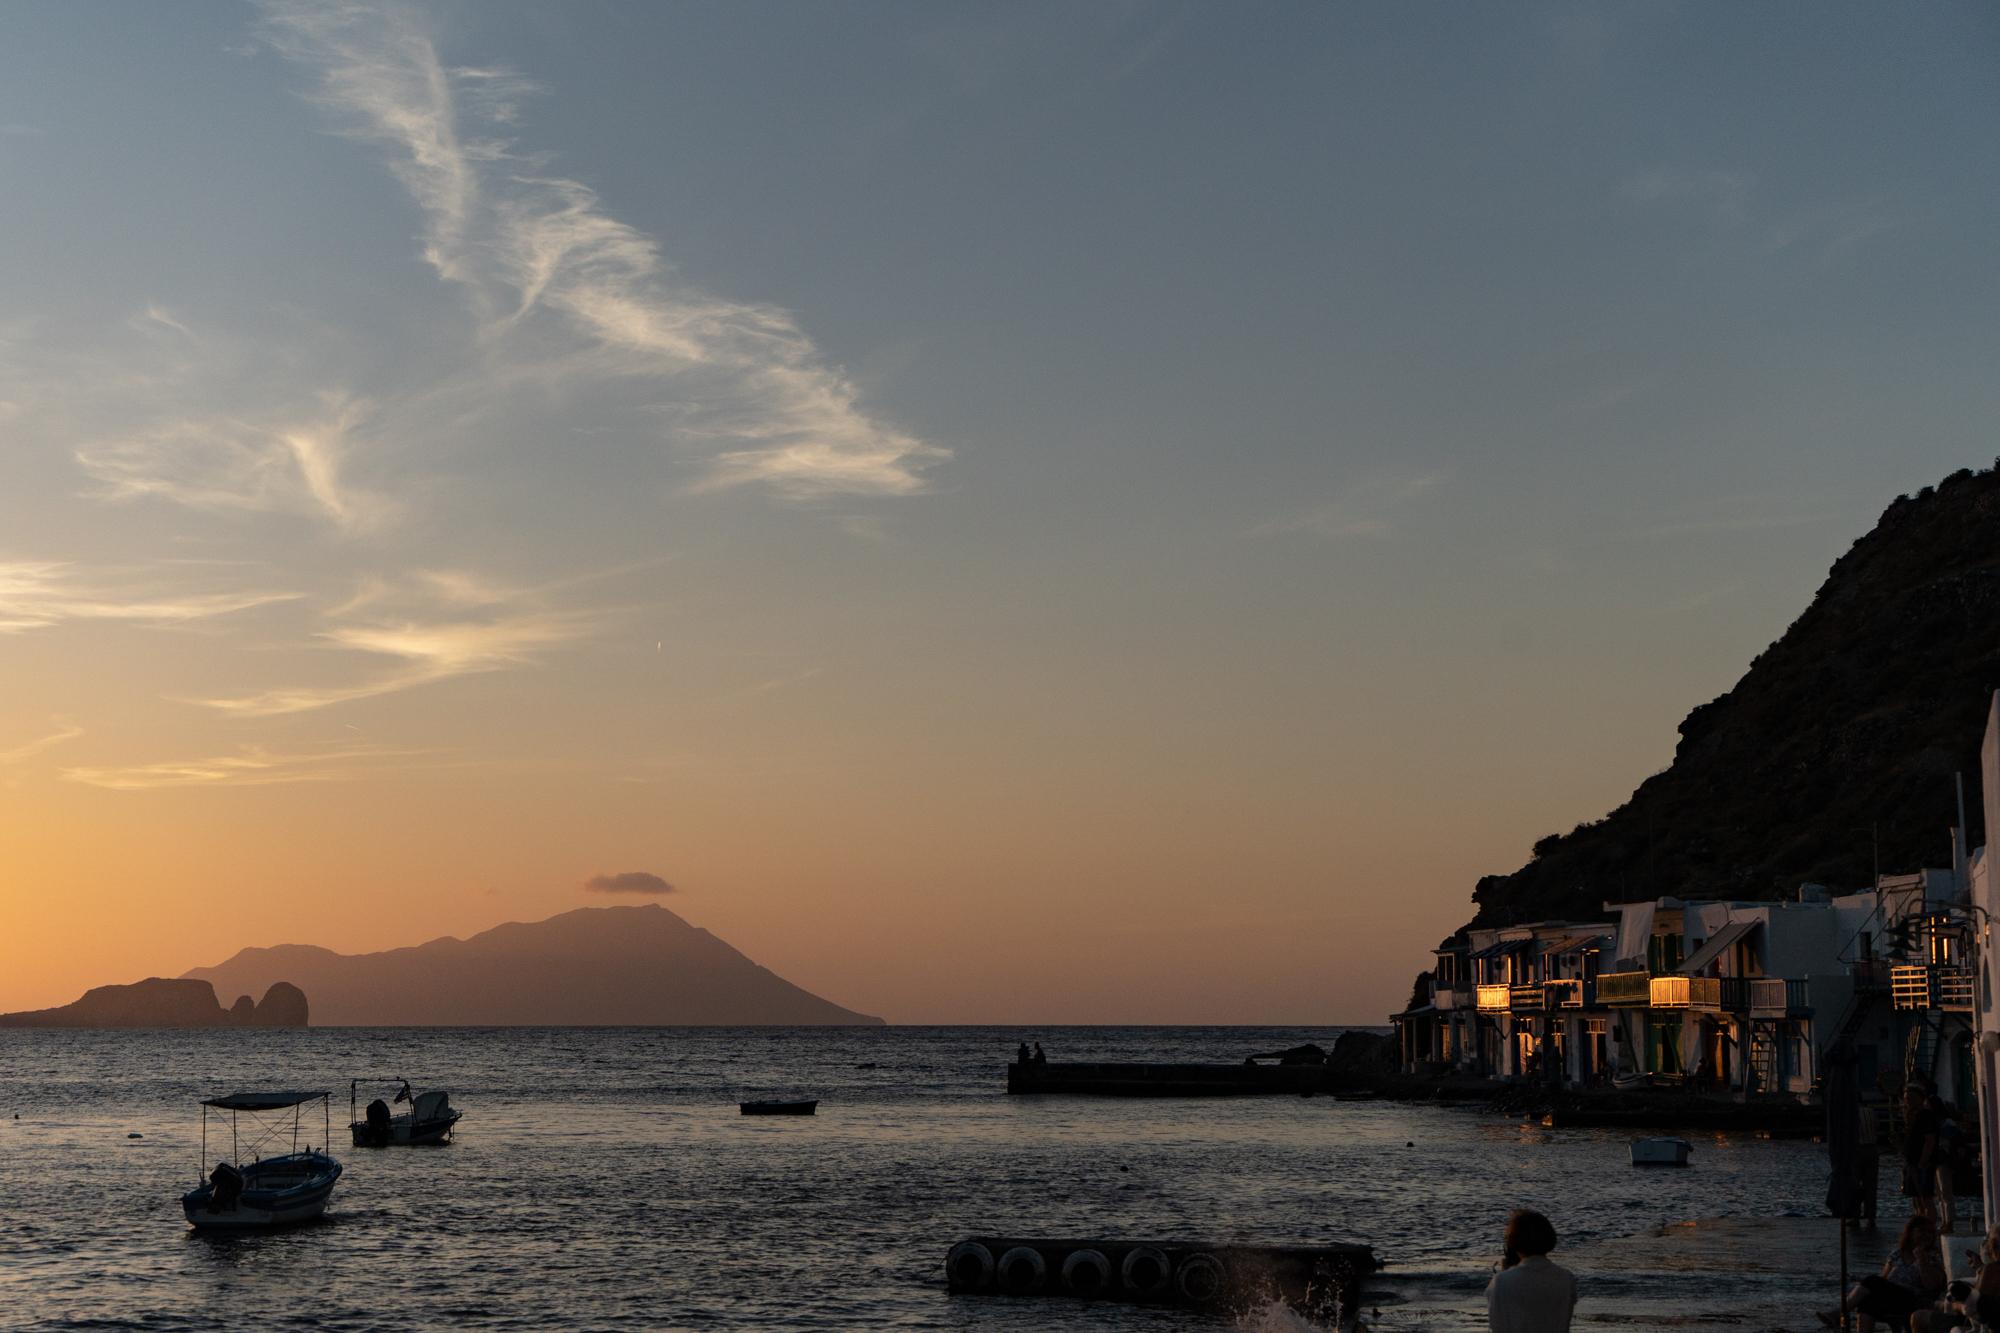 KLIMA FISHING VILLAGE Milos Greece at sunset